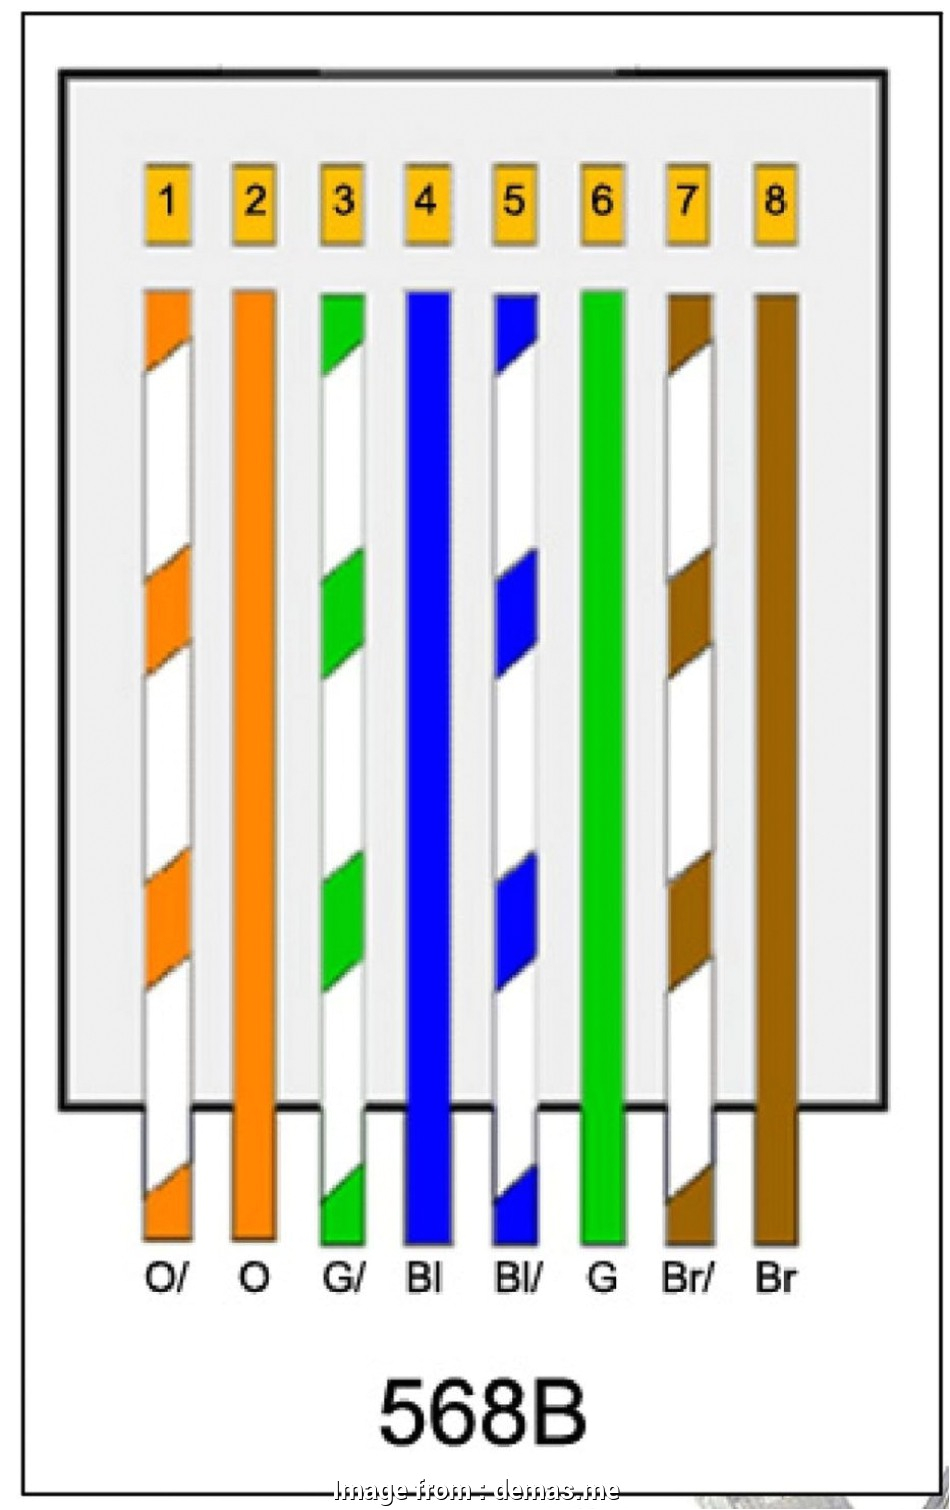 Cat5 Wiring Diagram Pdf Cat 5 Phone Wire Diagram Wiring Diagrams Recent